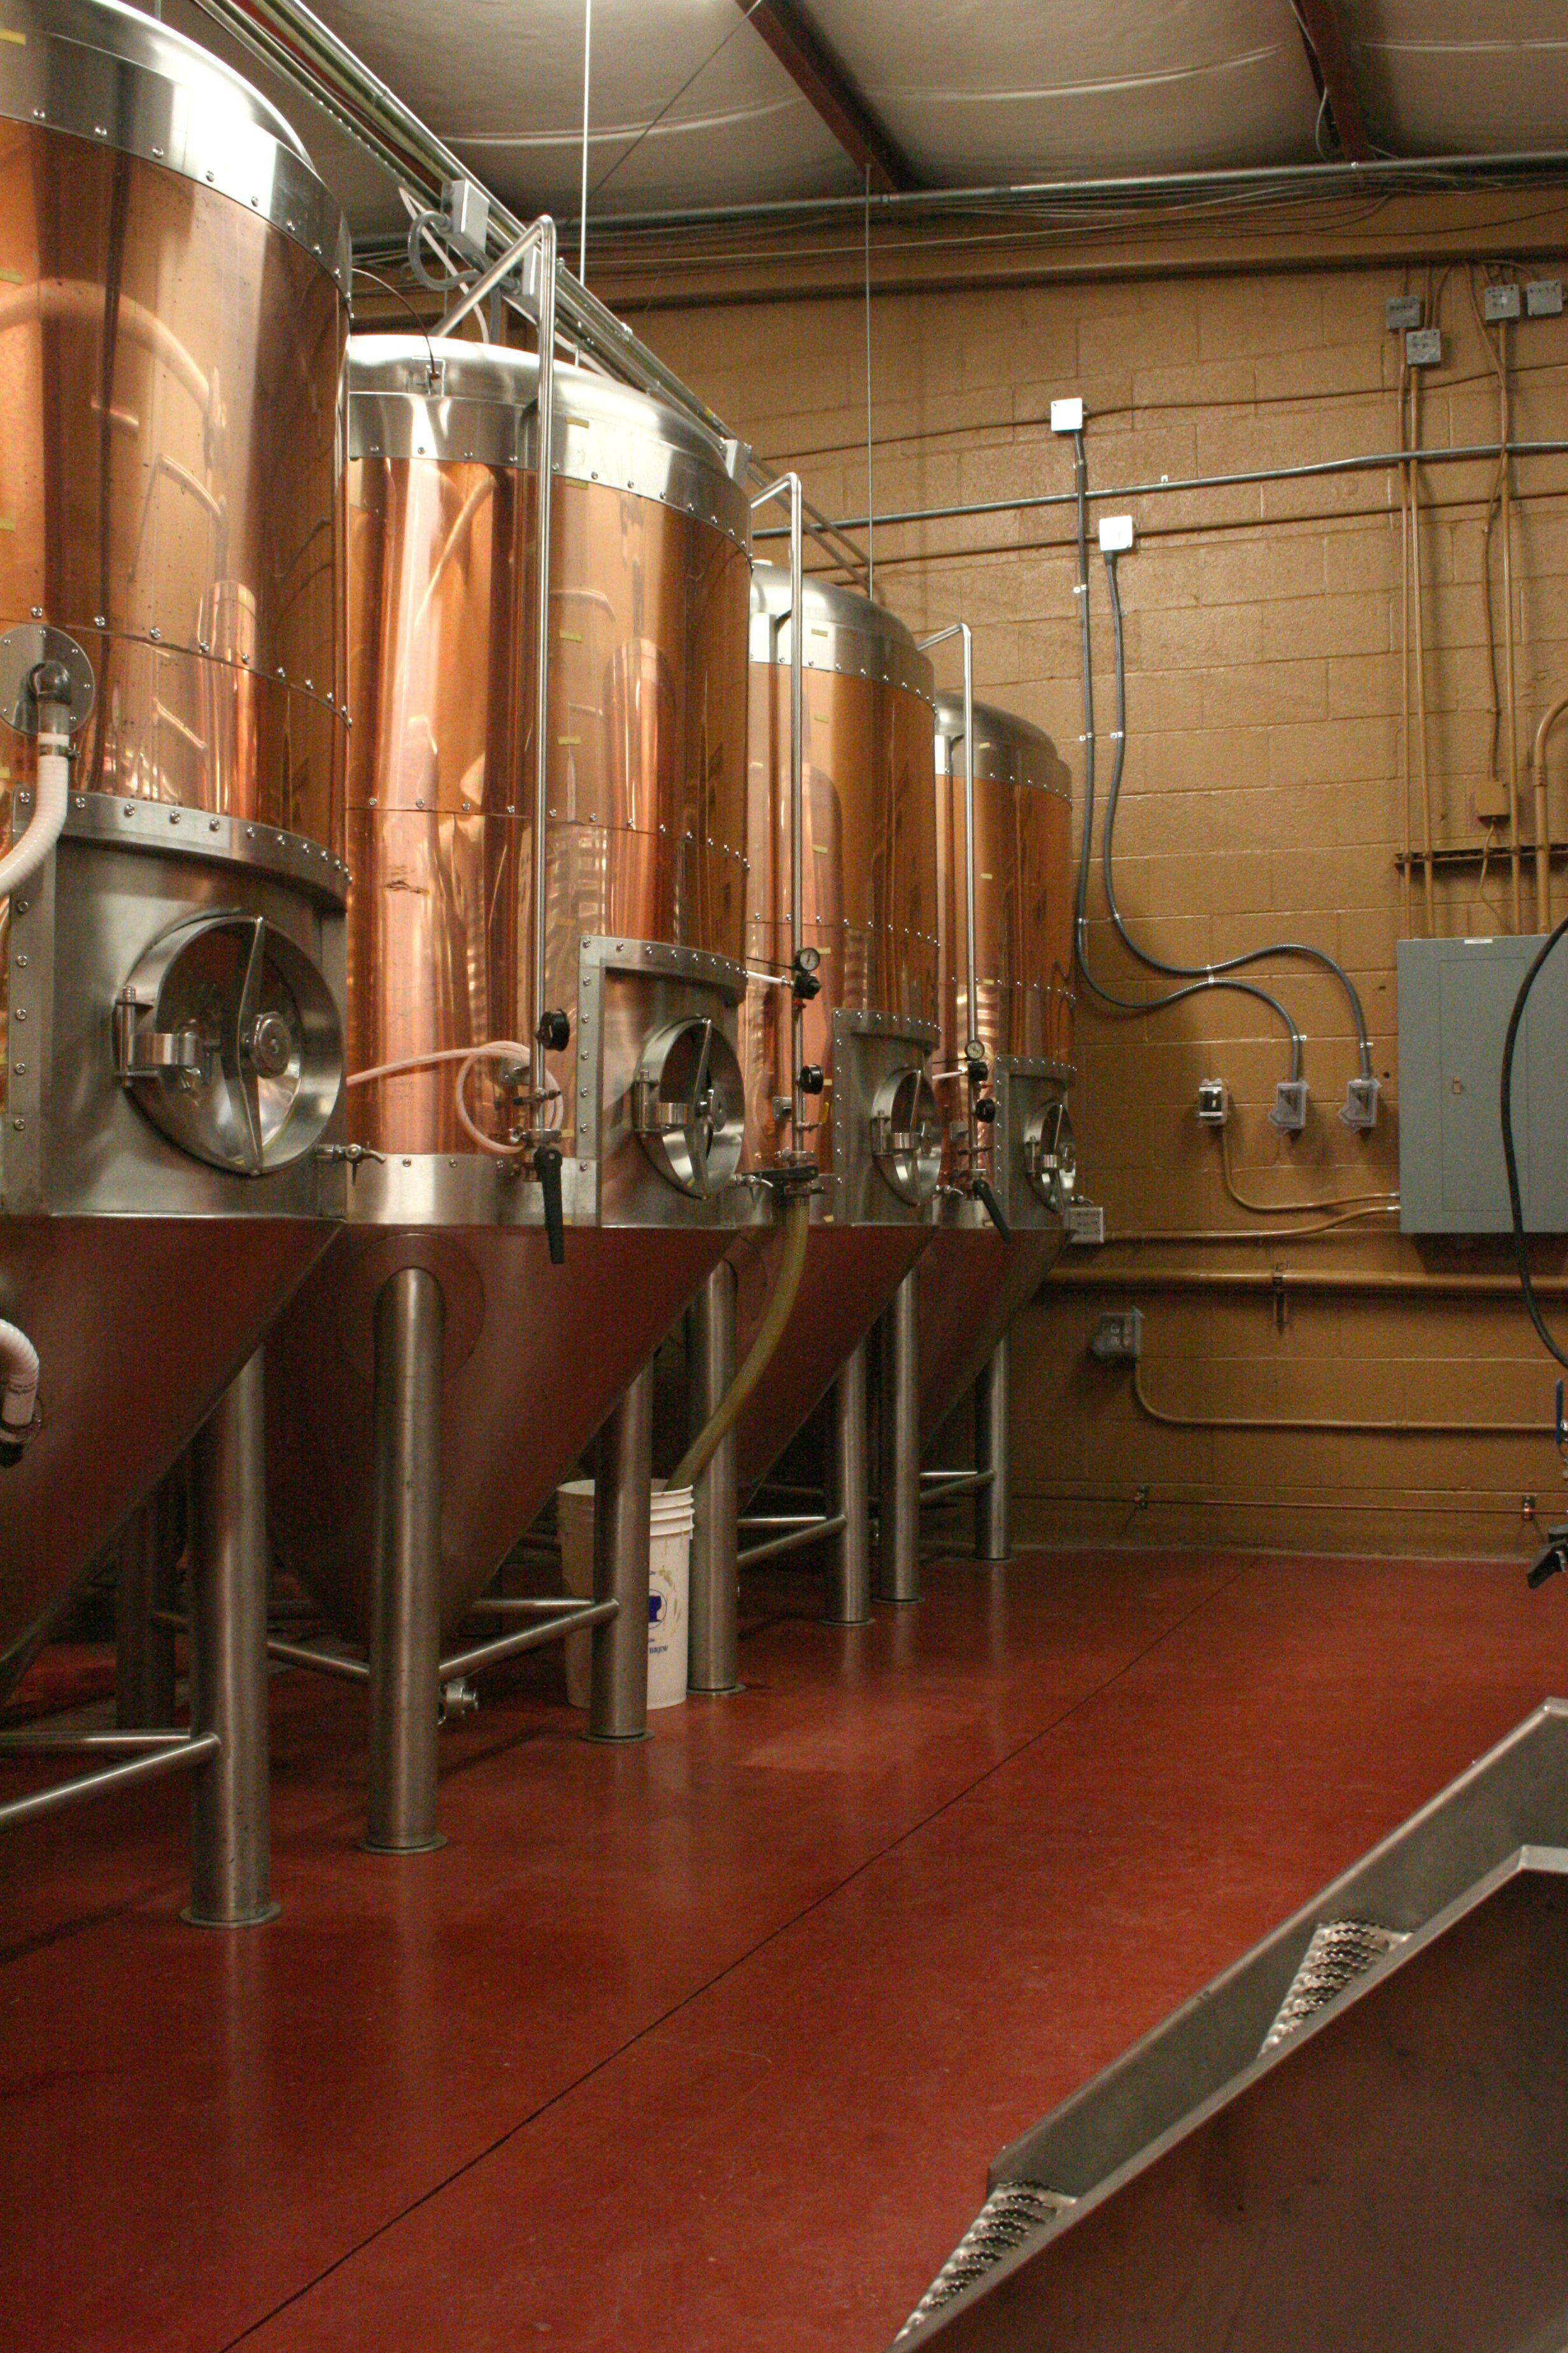 brewery - Google Search   Beer cellar, Beer factory ...